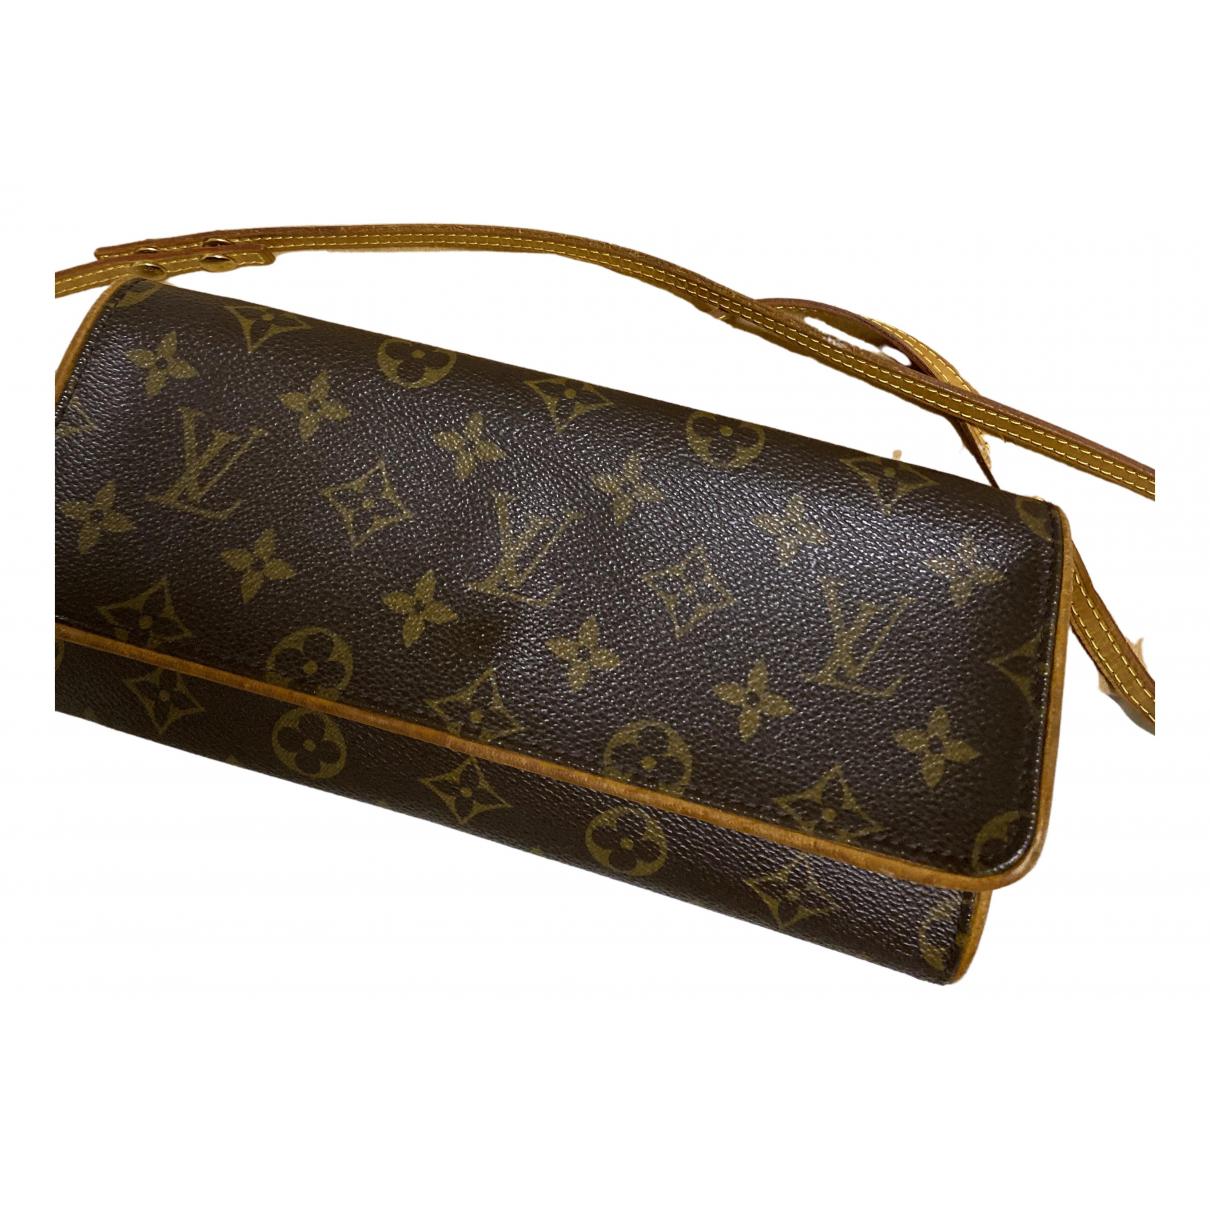 Louis Vuitton Twin Multicolour Leather handbag for Women \N